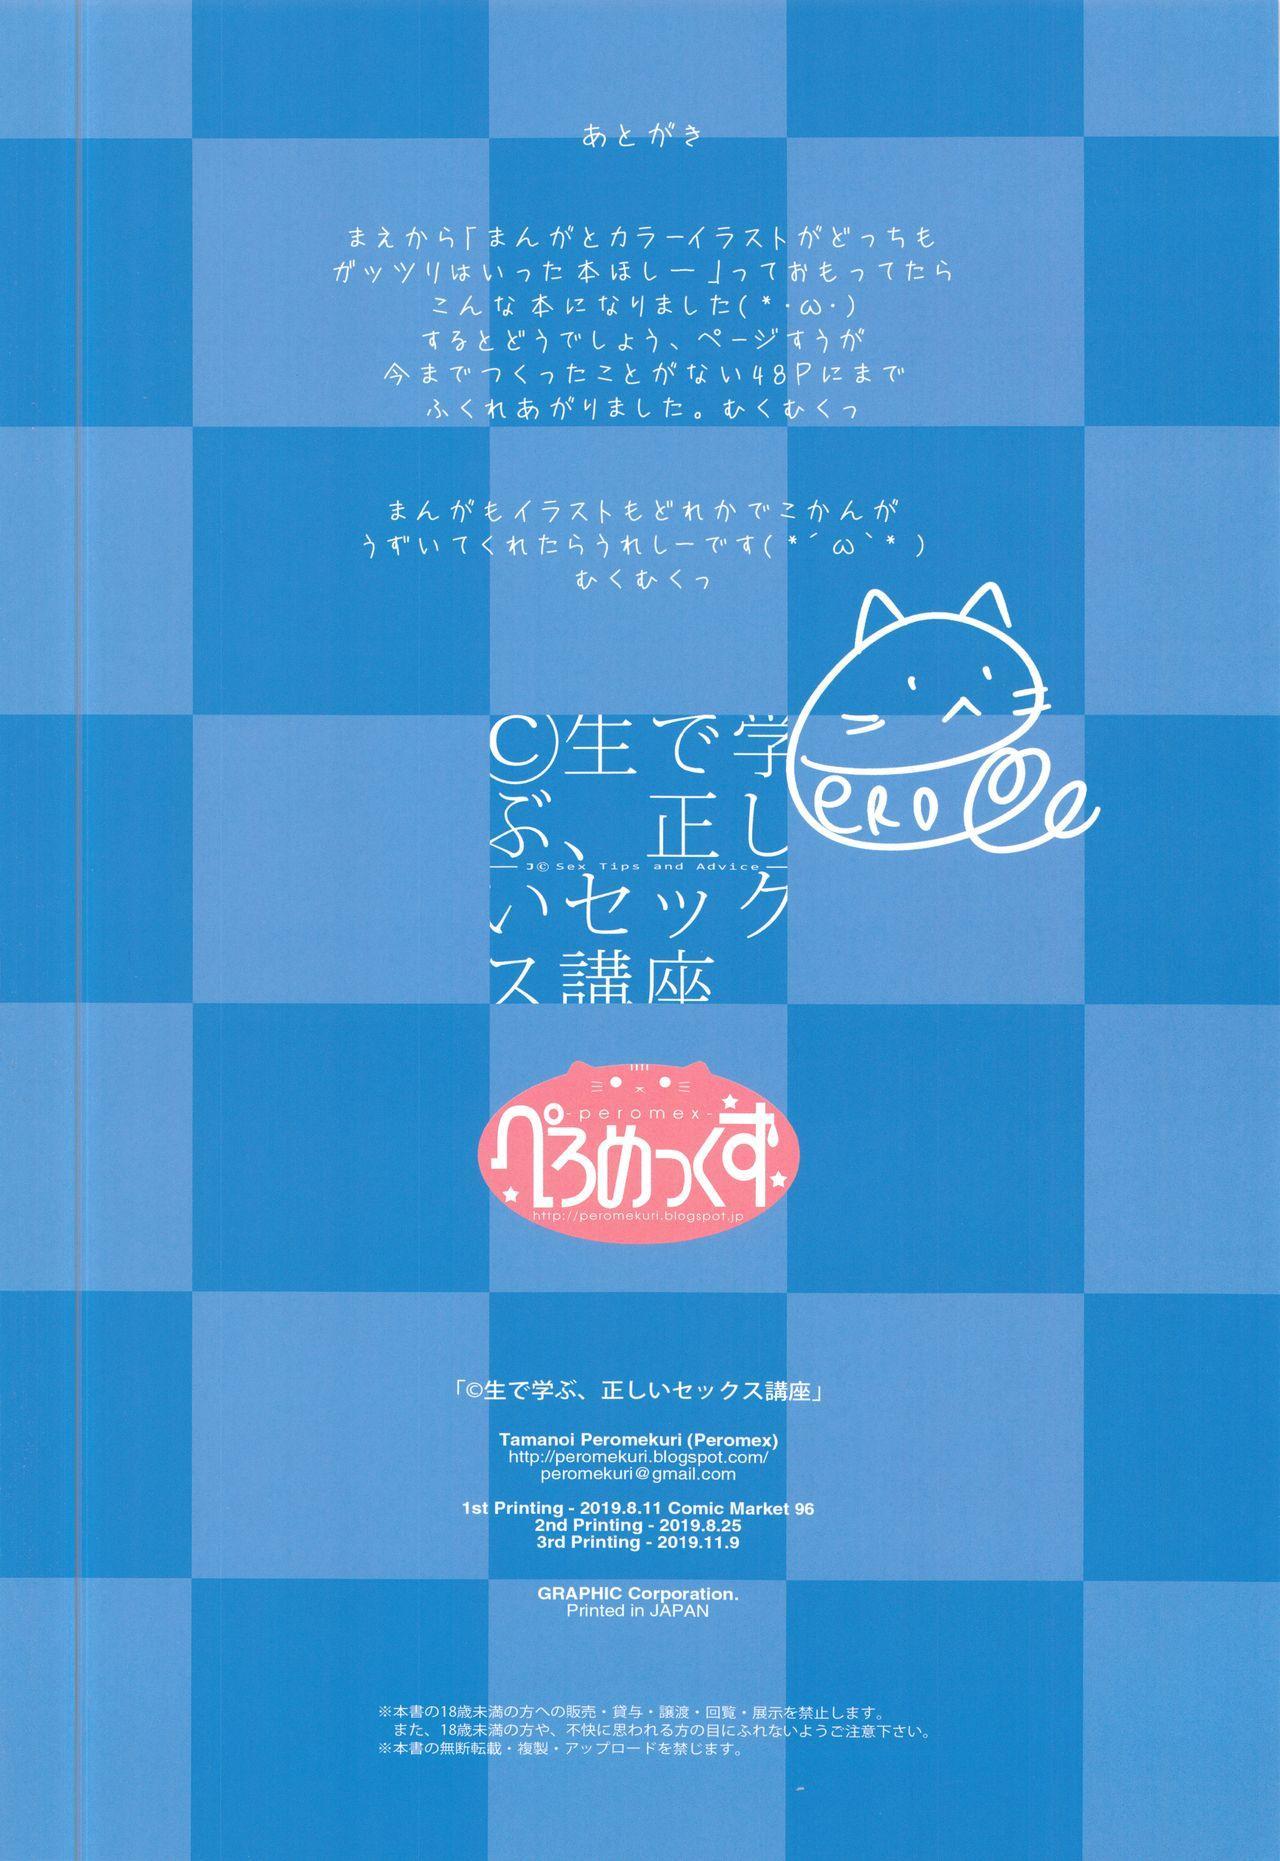 [Peromex (Tamanoi Peromekuri)] ©-sei de Manabu, Tadashii Sex Kouza | JC Hands-On Proper Sex Lecture [English] [bientaimon] [2019-11-09] 44